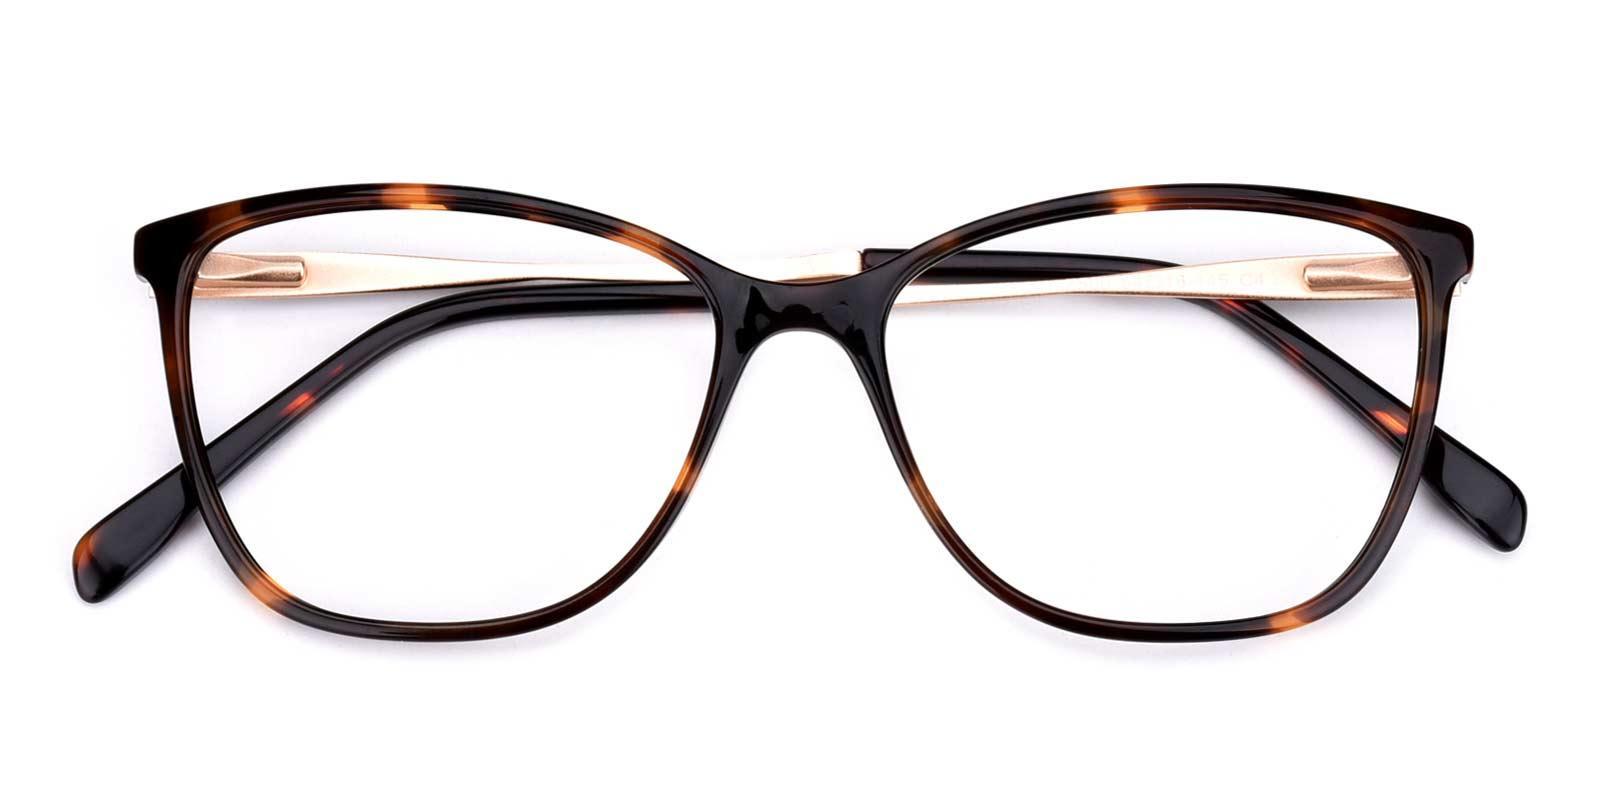 Night-Tortoise-Cat-Acetate-Eyeglasses-detail